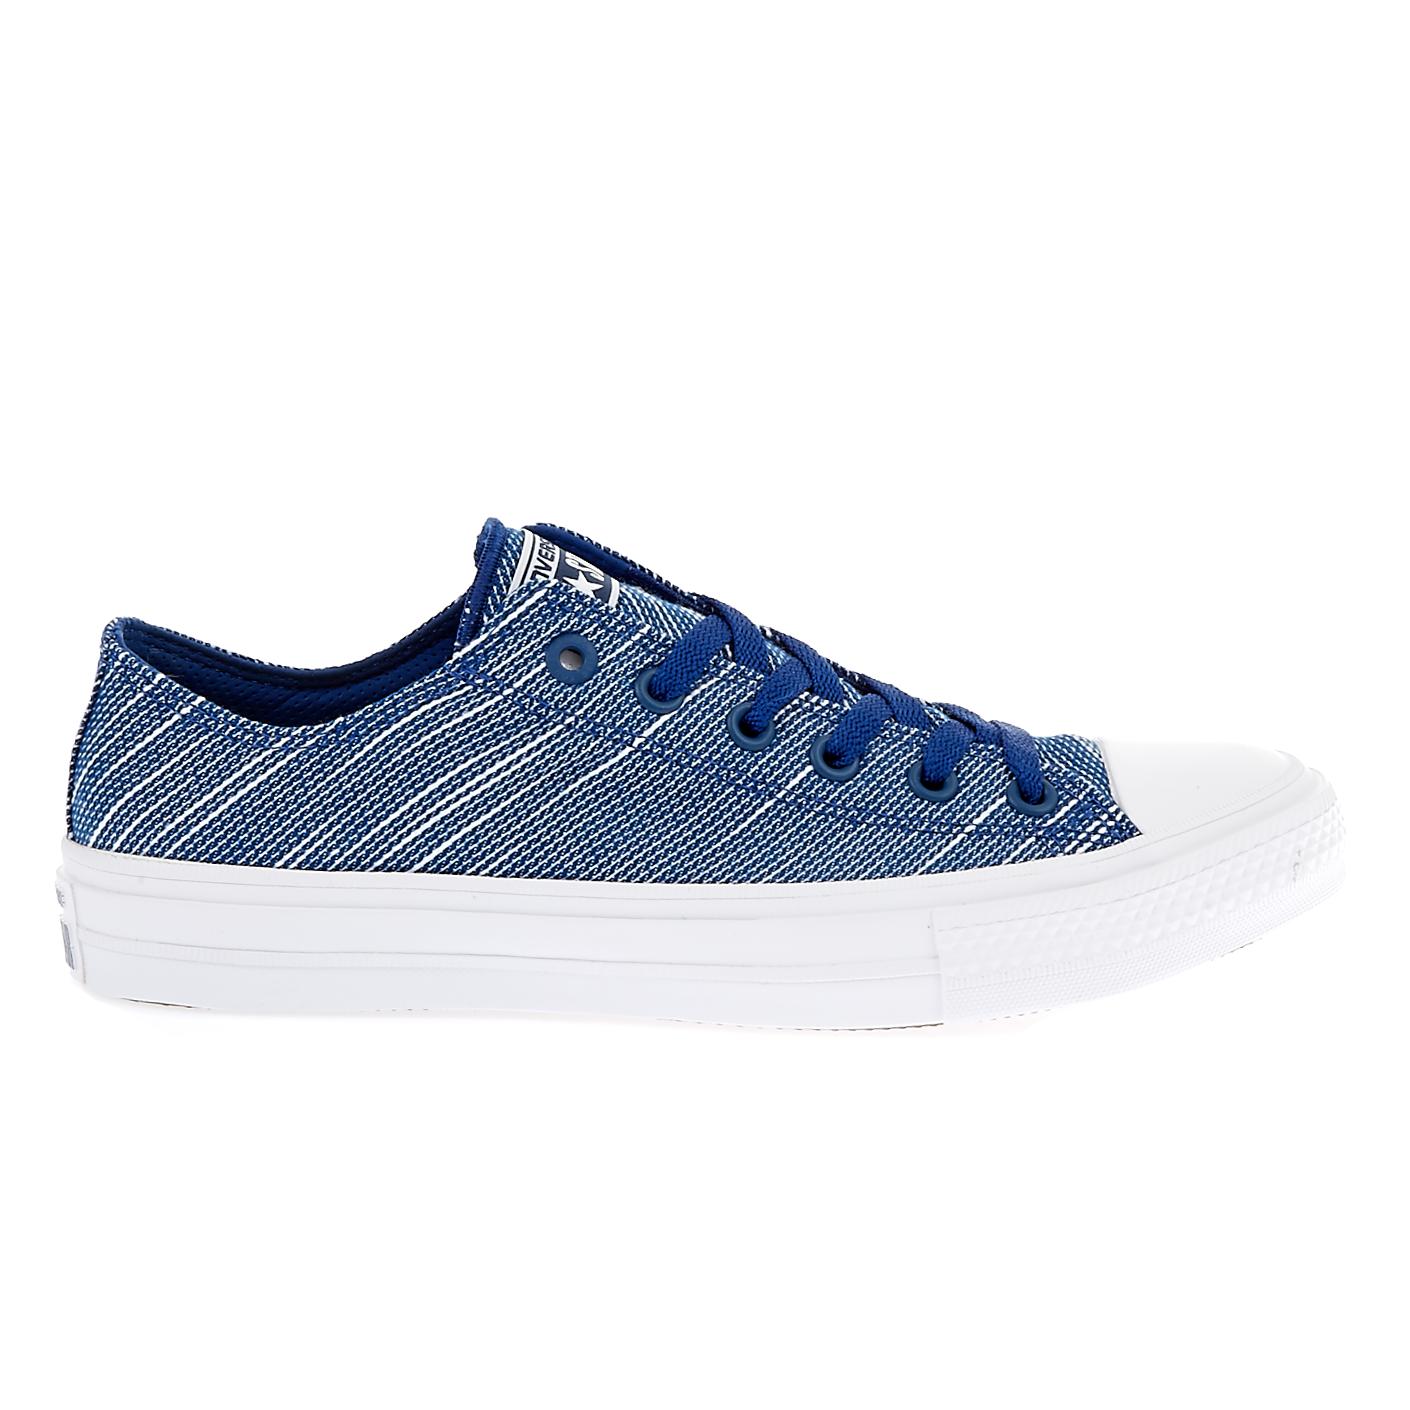 CONVERSE - Unisex παπούτσια Chuck Taylor All Star II Ox μπλε γυναικεία παπούτσια sneakers